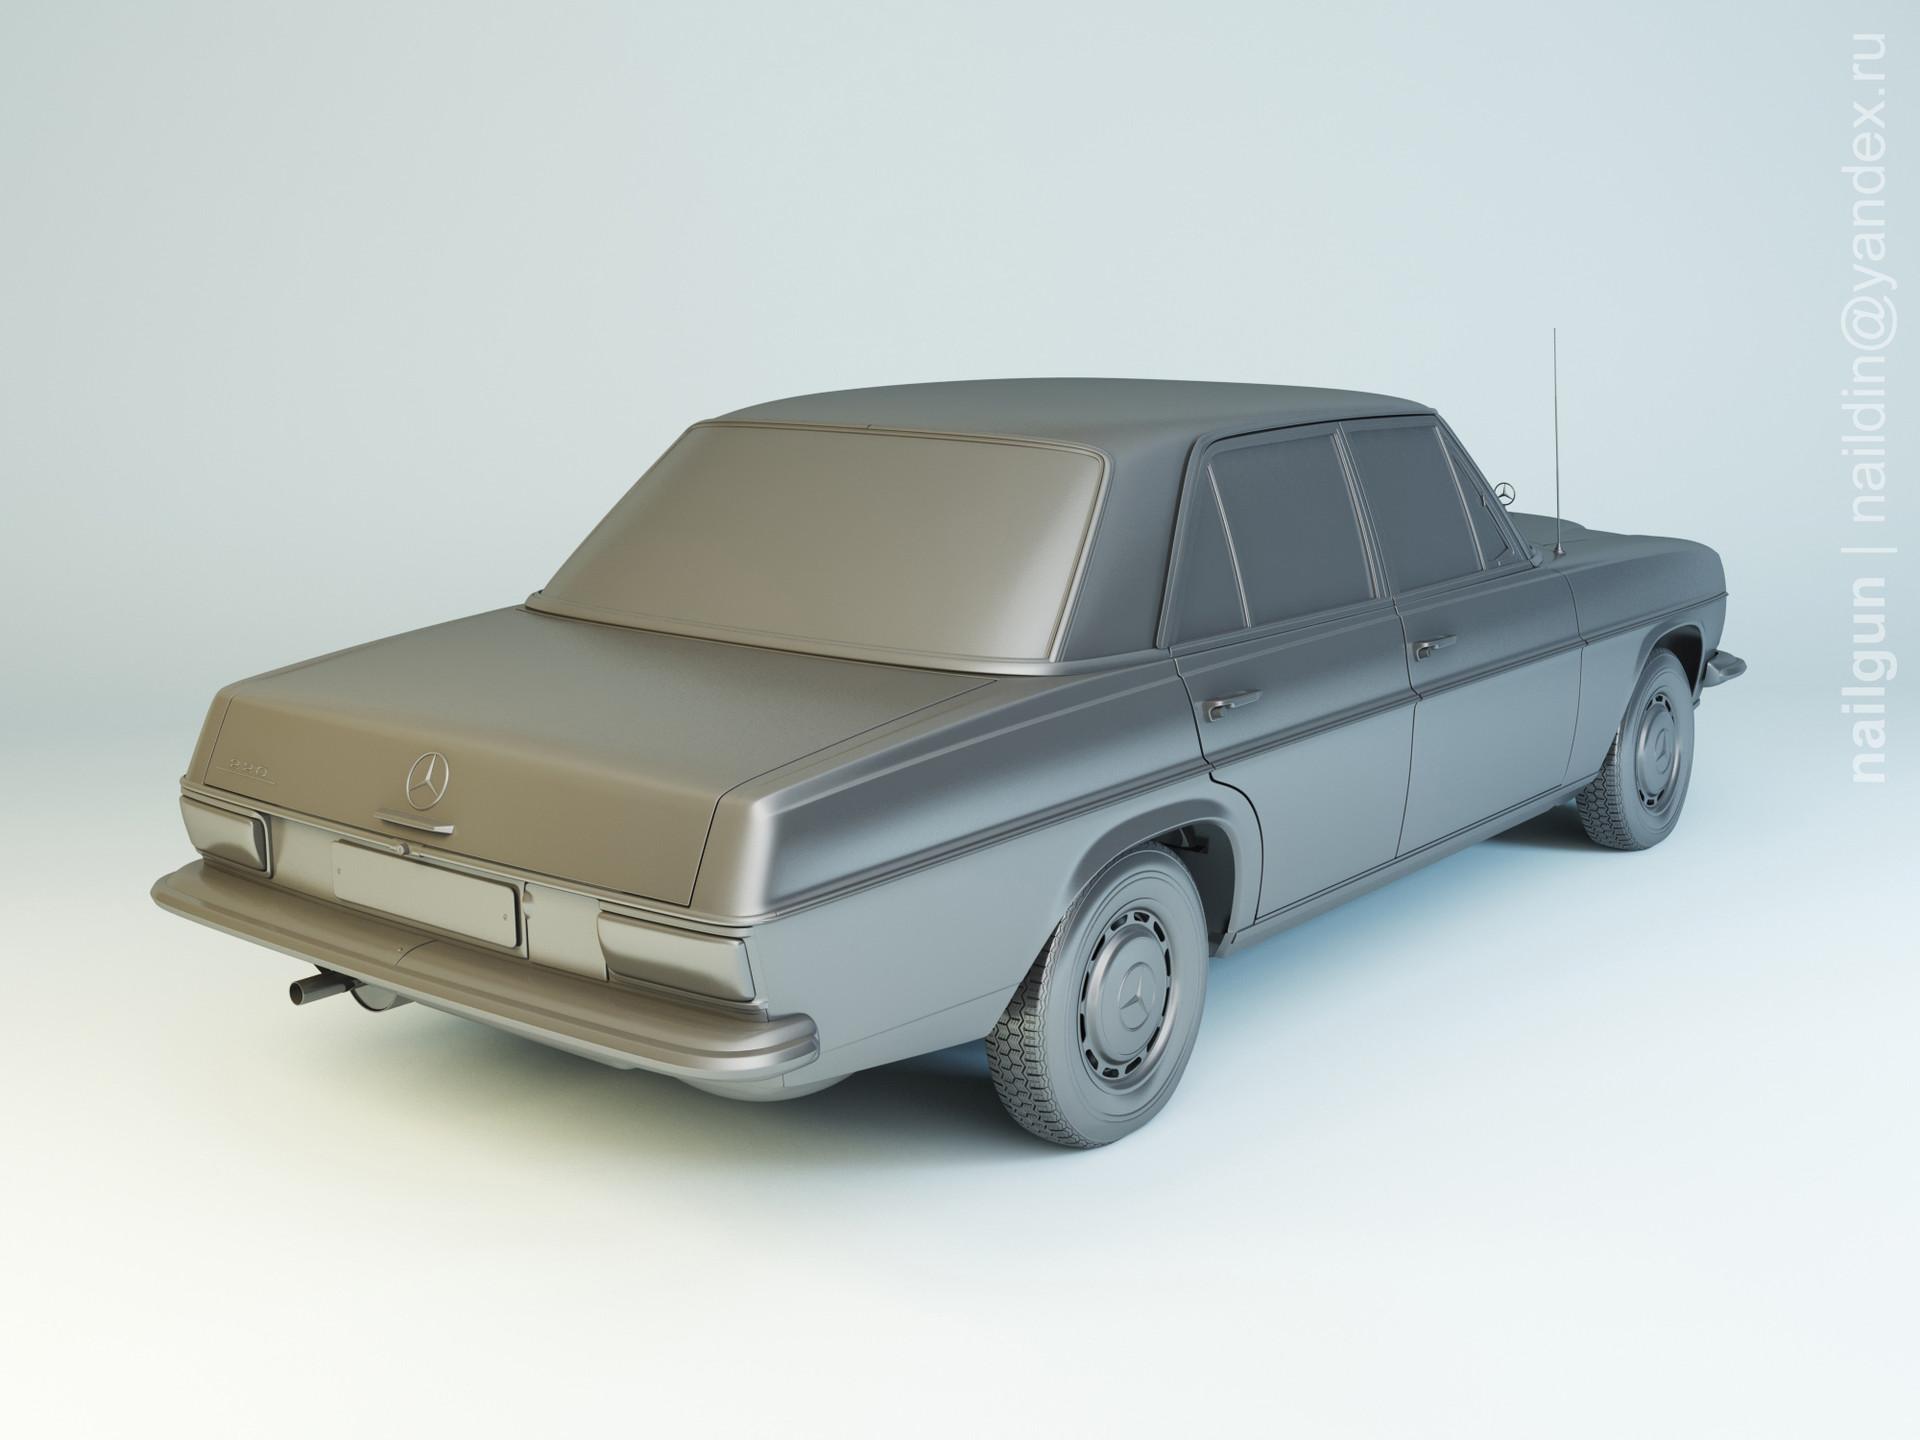 Nail khusnutdinov pwc 070 003 mercedes w114 modelling 1